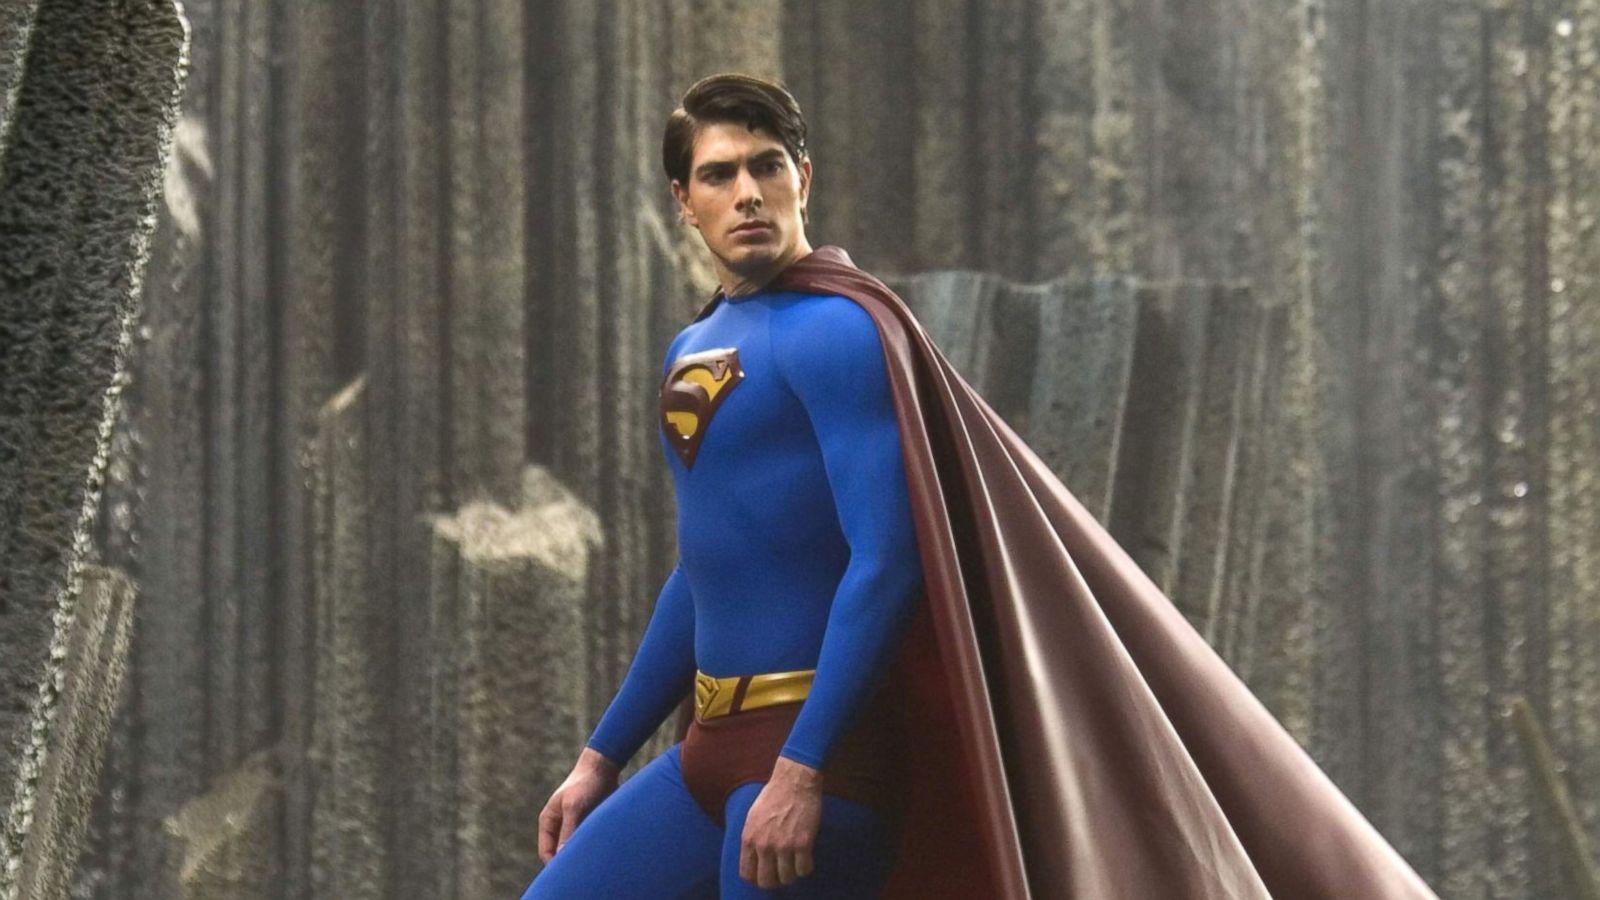 Batman v Superman': What Happened to Brandon Routh - ABC News